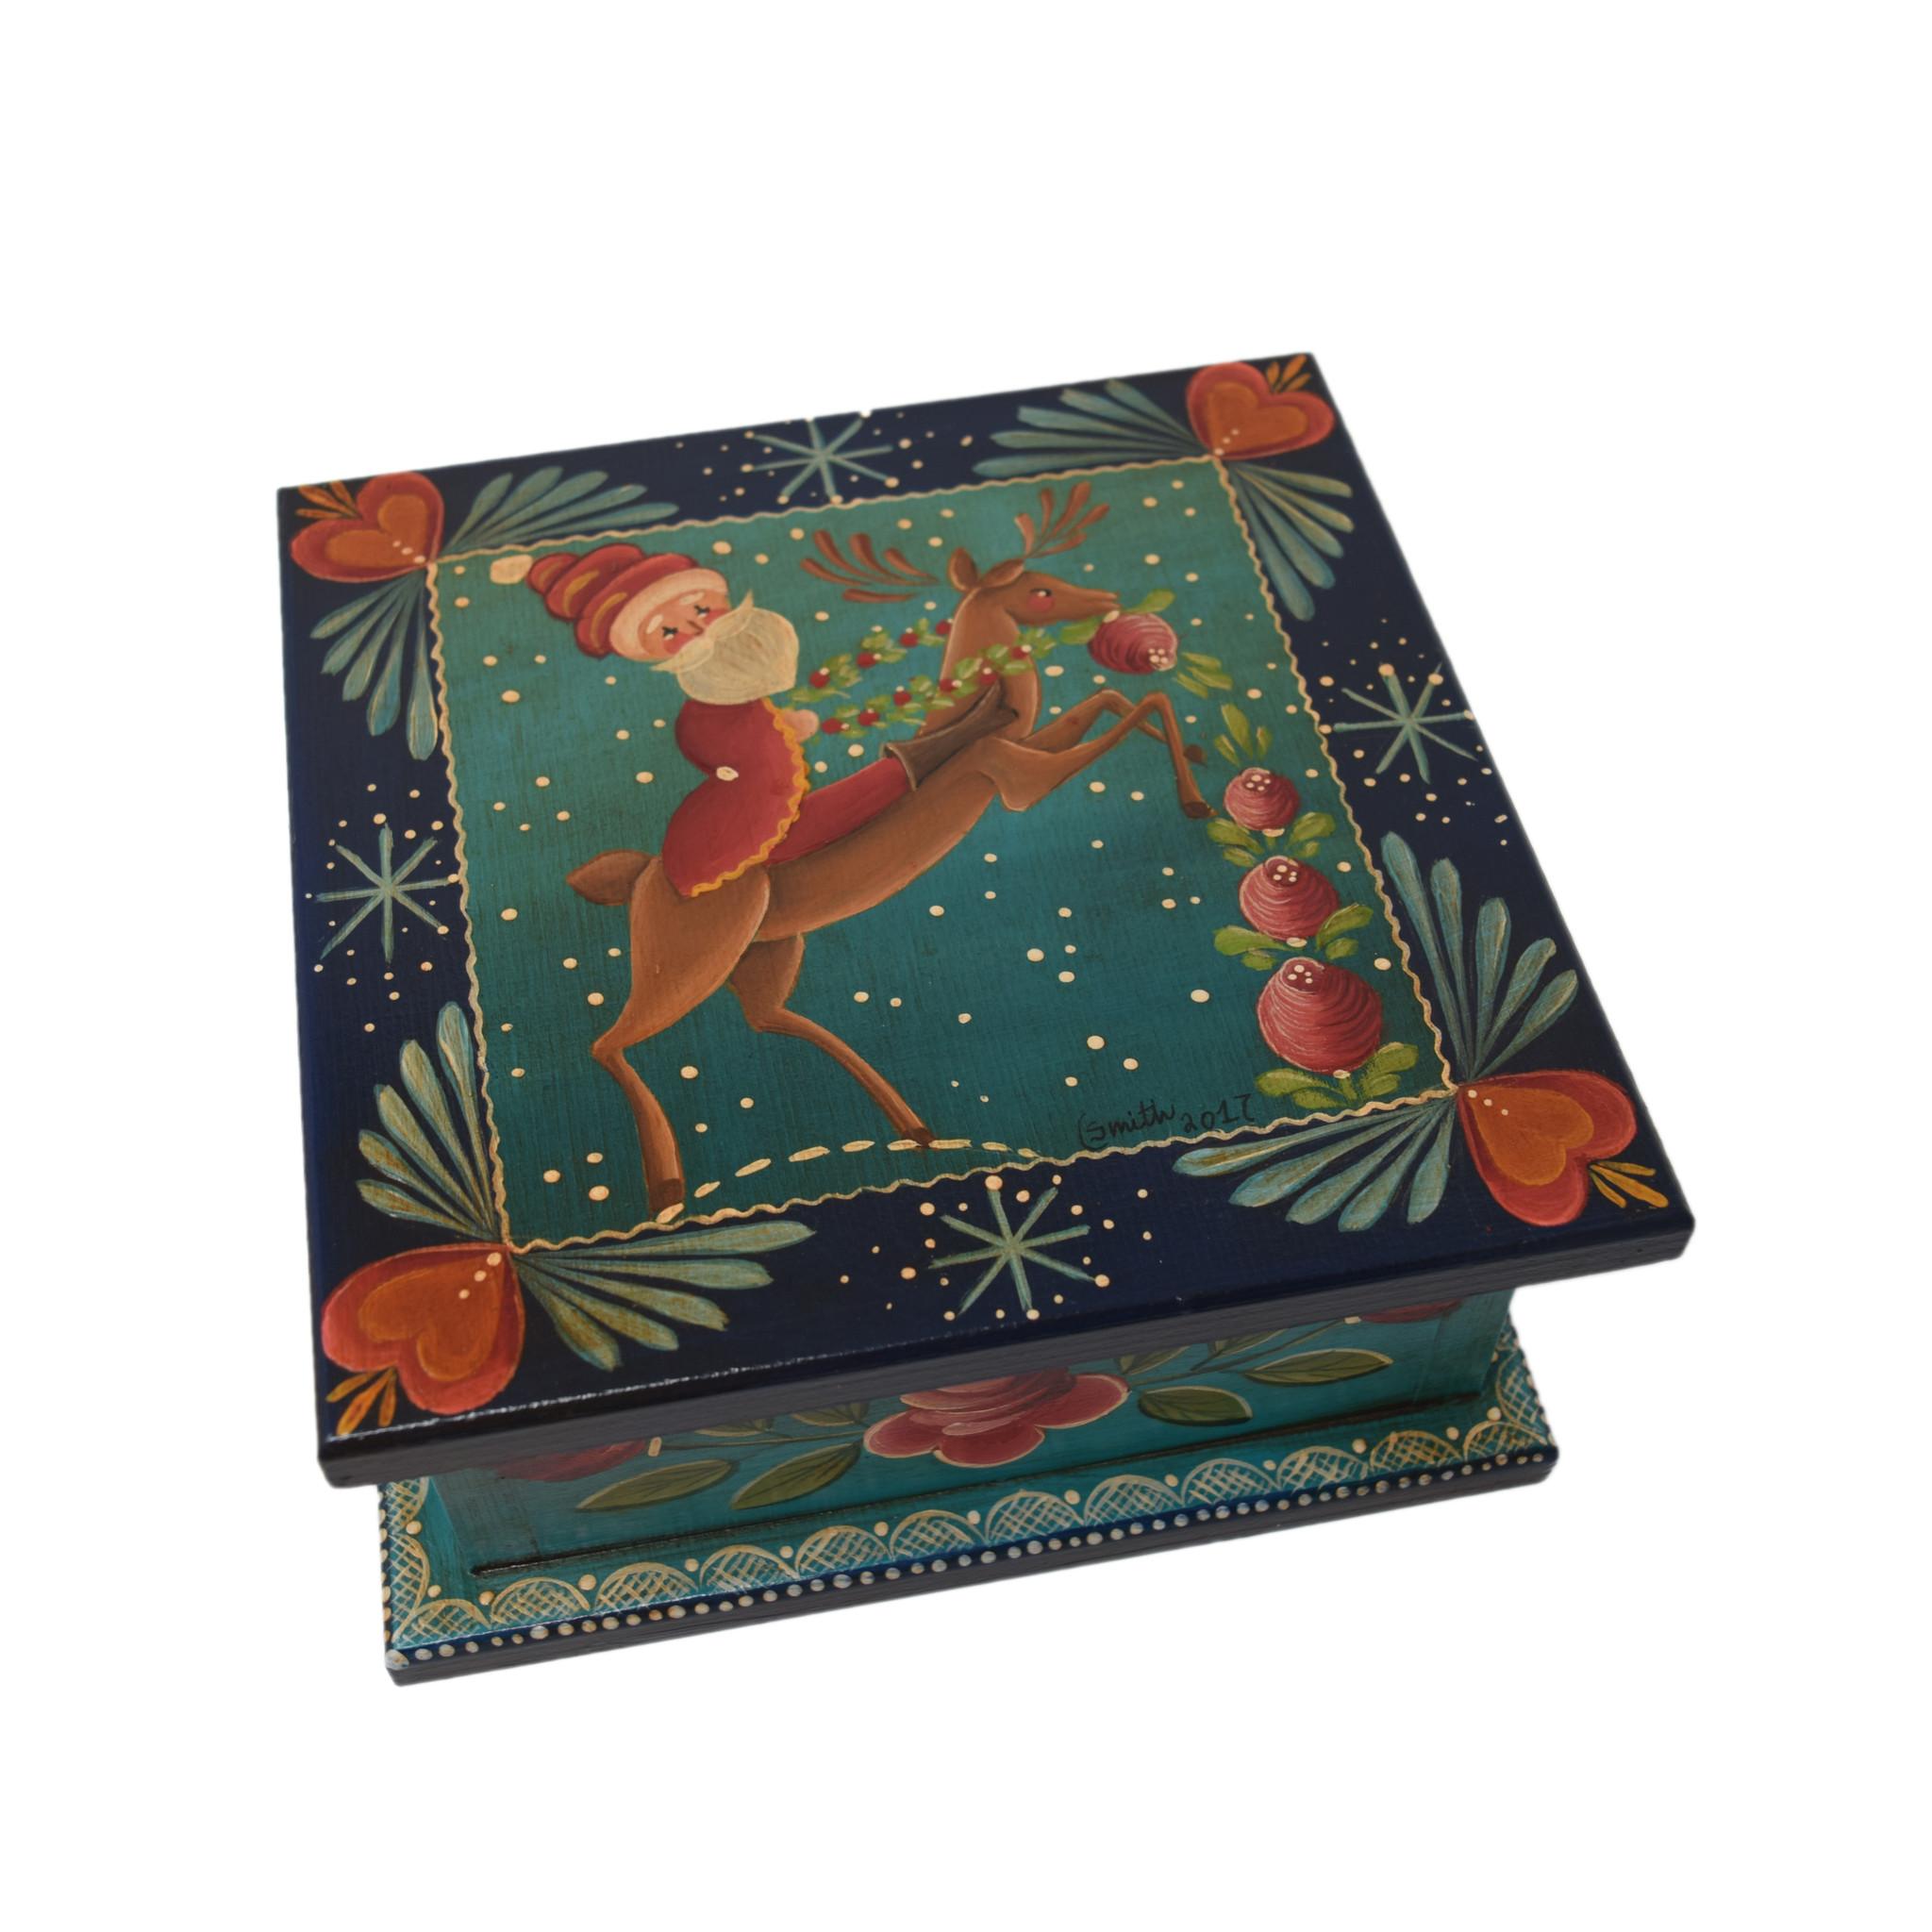 Square Dark Blue/Green Box with Santa-1